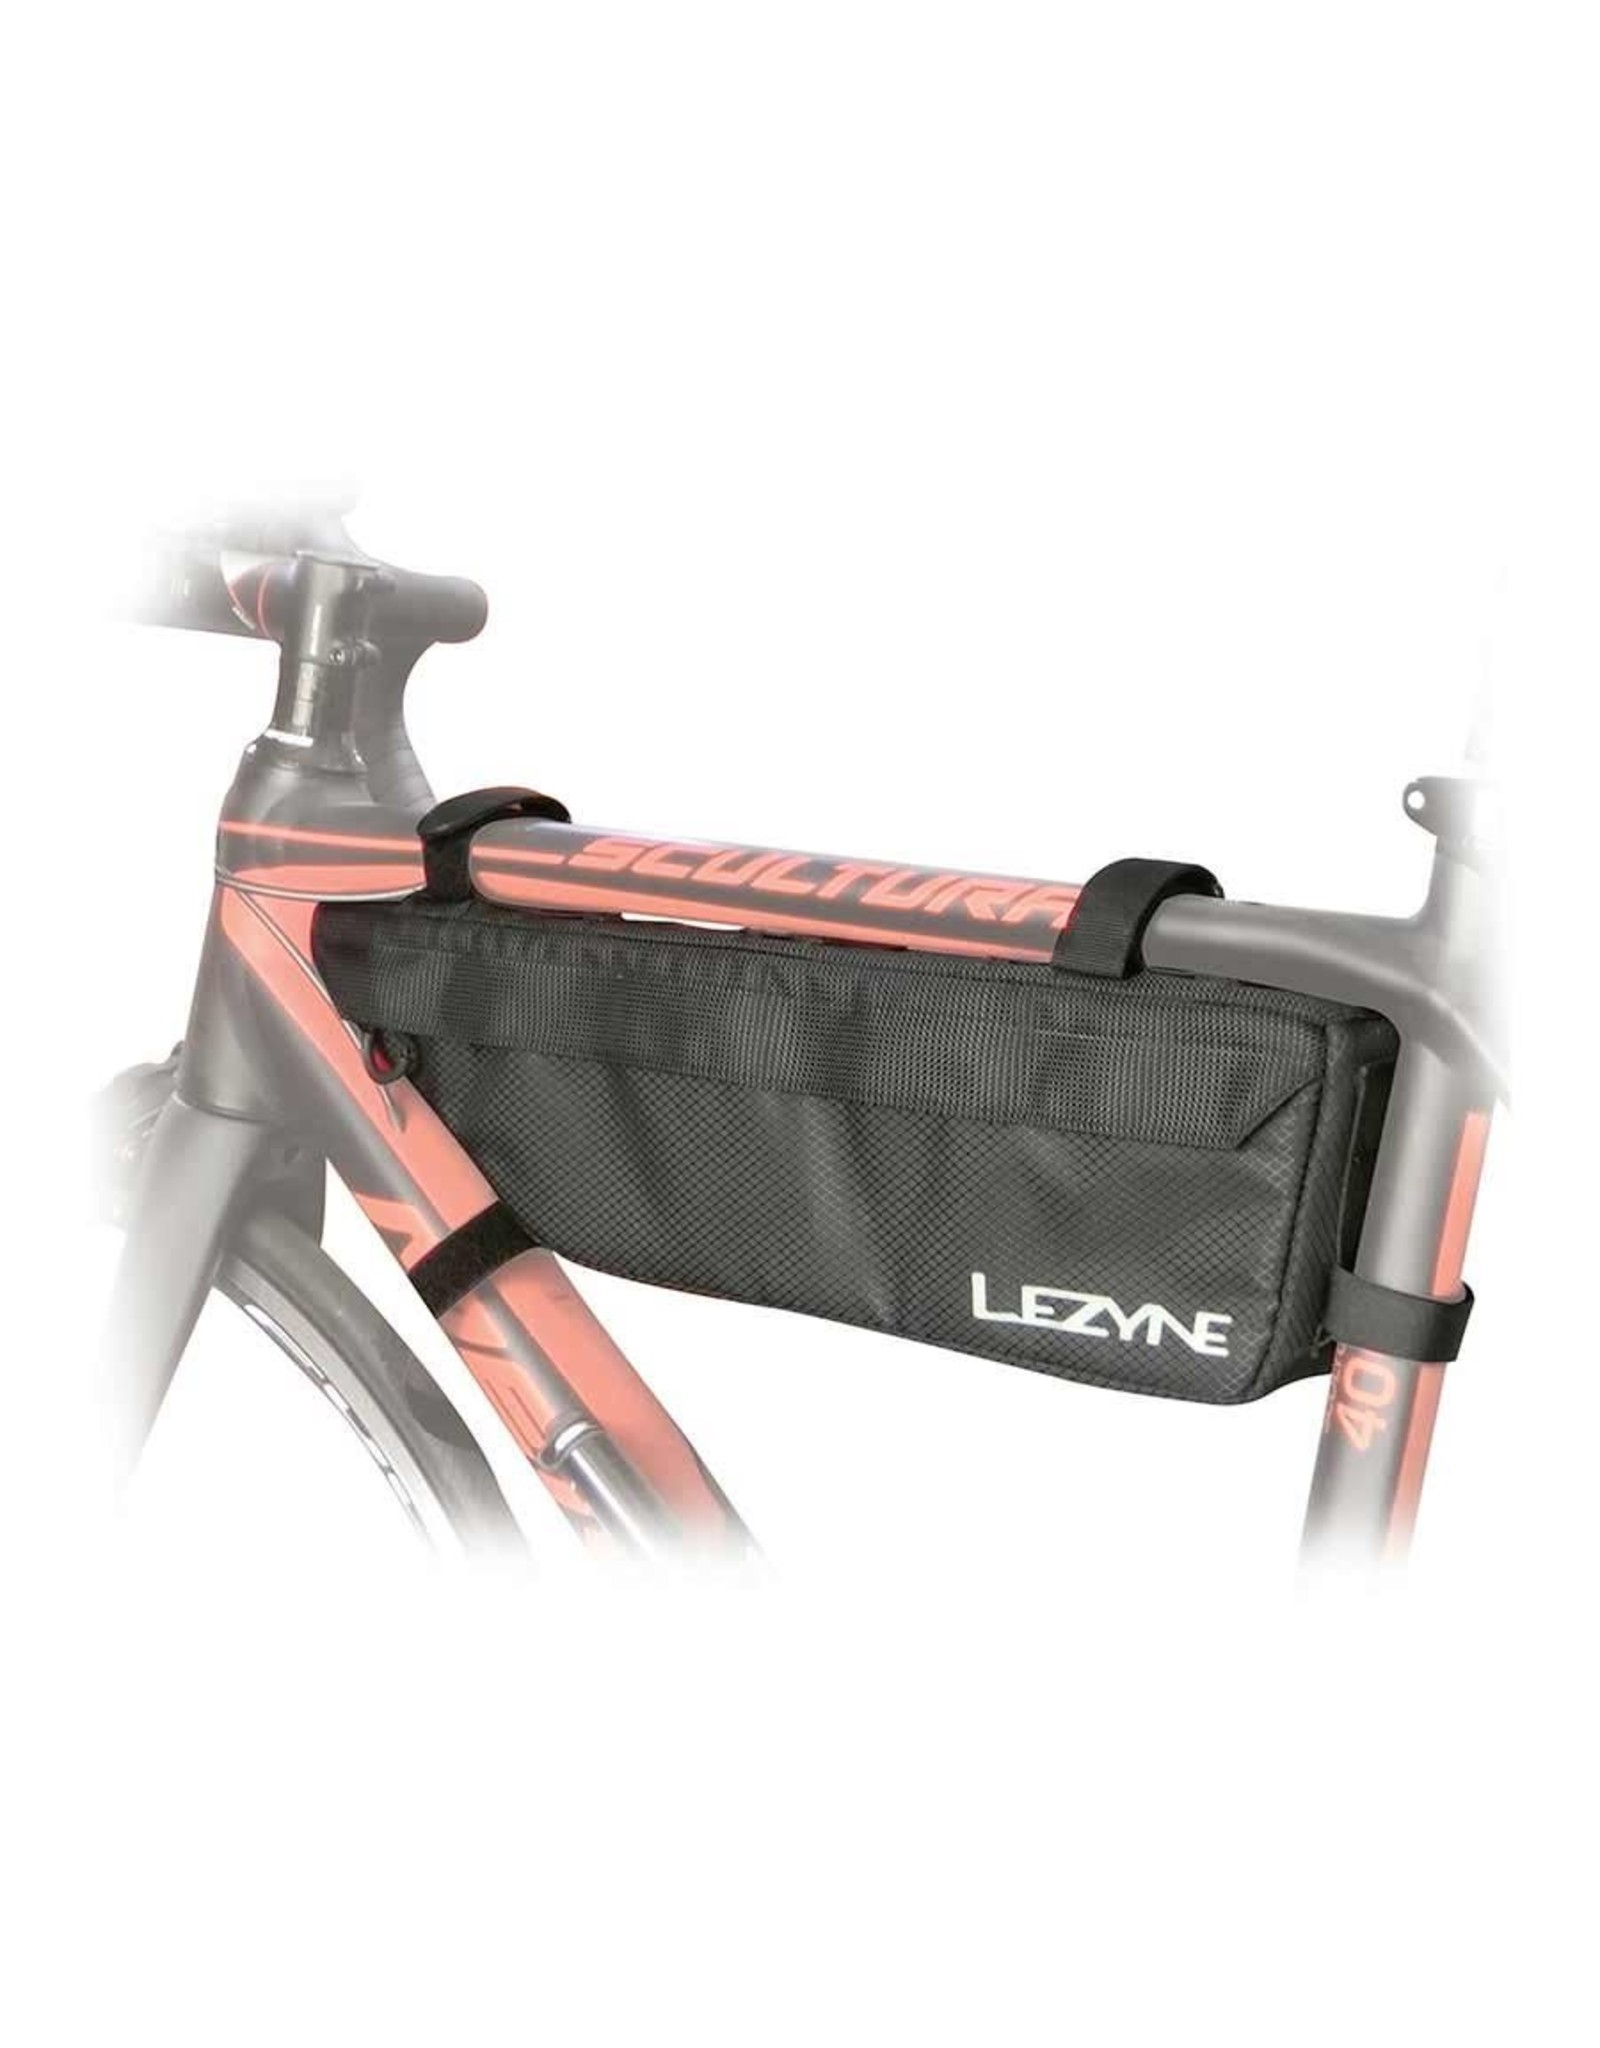 Lezyne Frame bag Lezyne Caddy 2.5L black